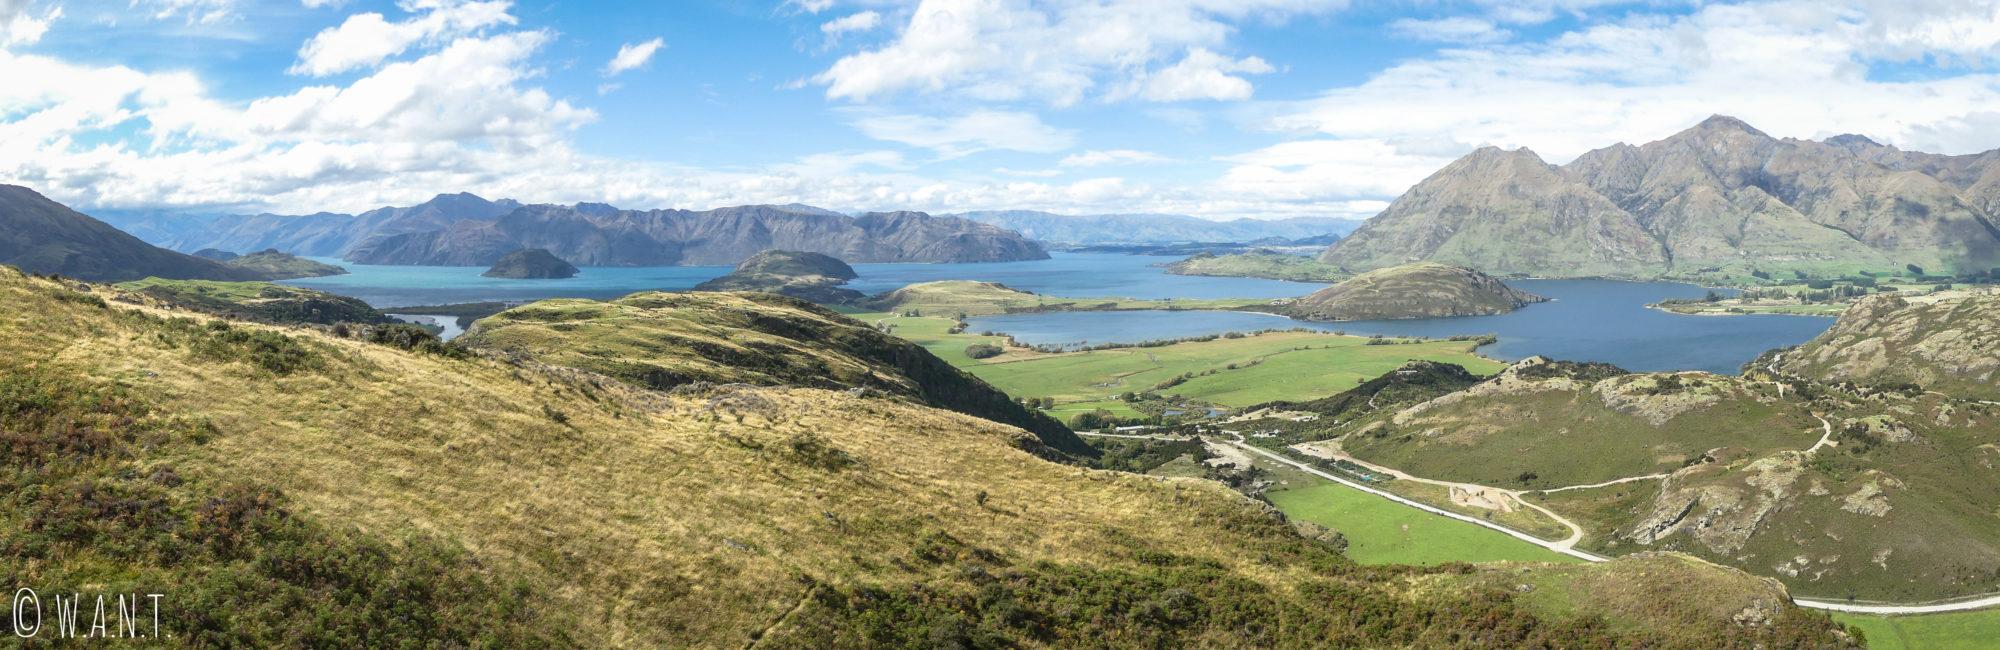 Panorama depuis la randonnée Diamond Lake près de Wanaka en Nouvelle-Zélande